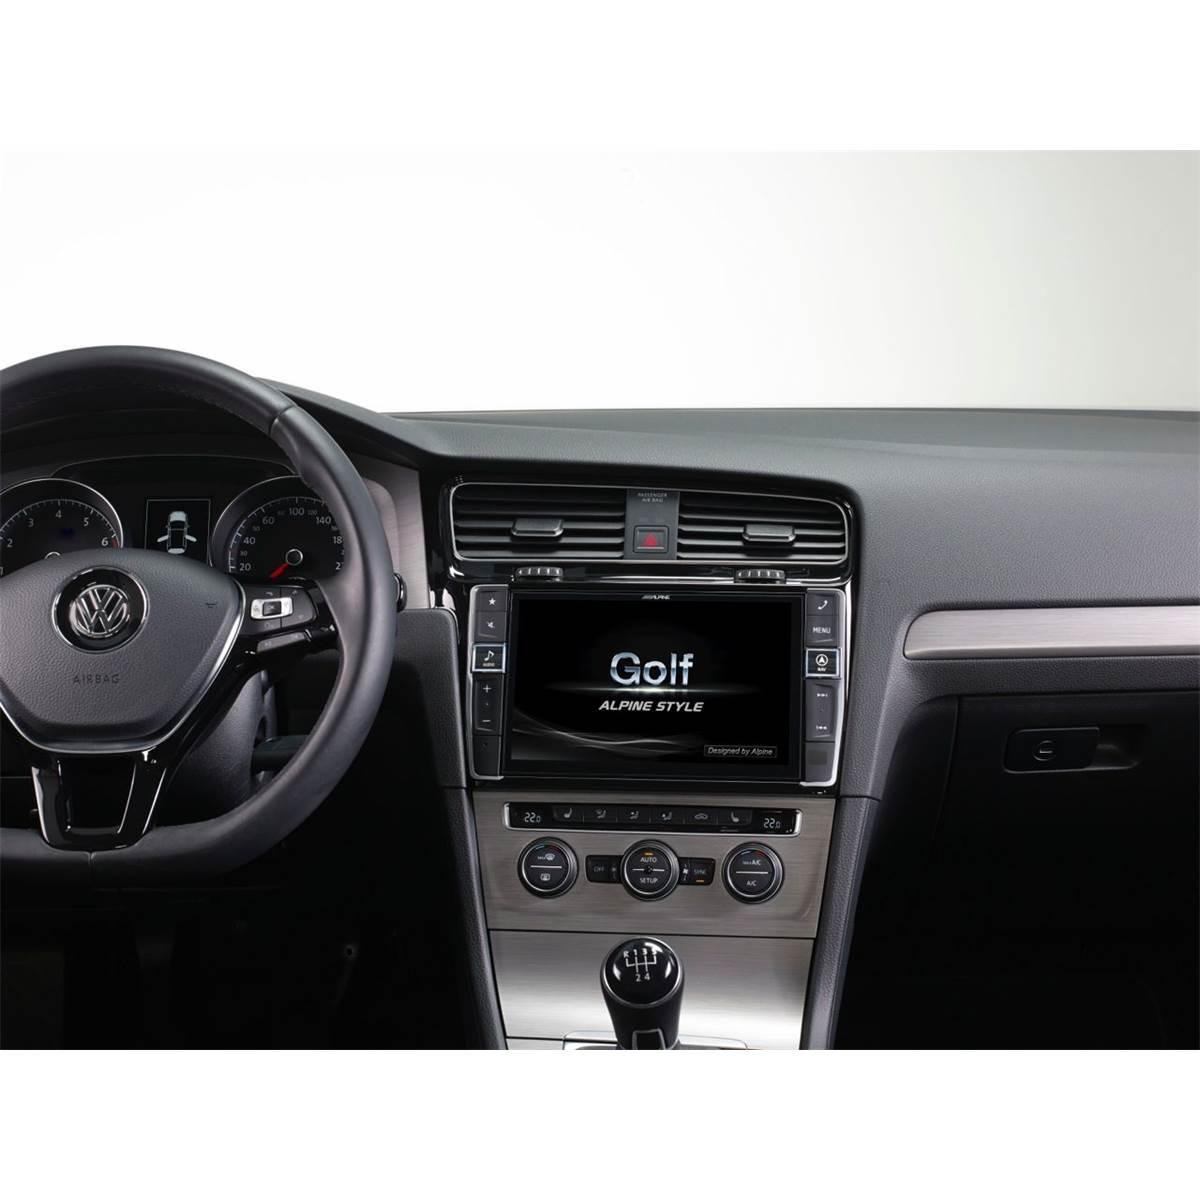 Autoradio GPS Alpine X901D-G7 pour Golf 7